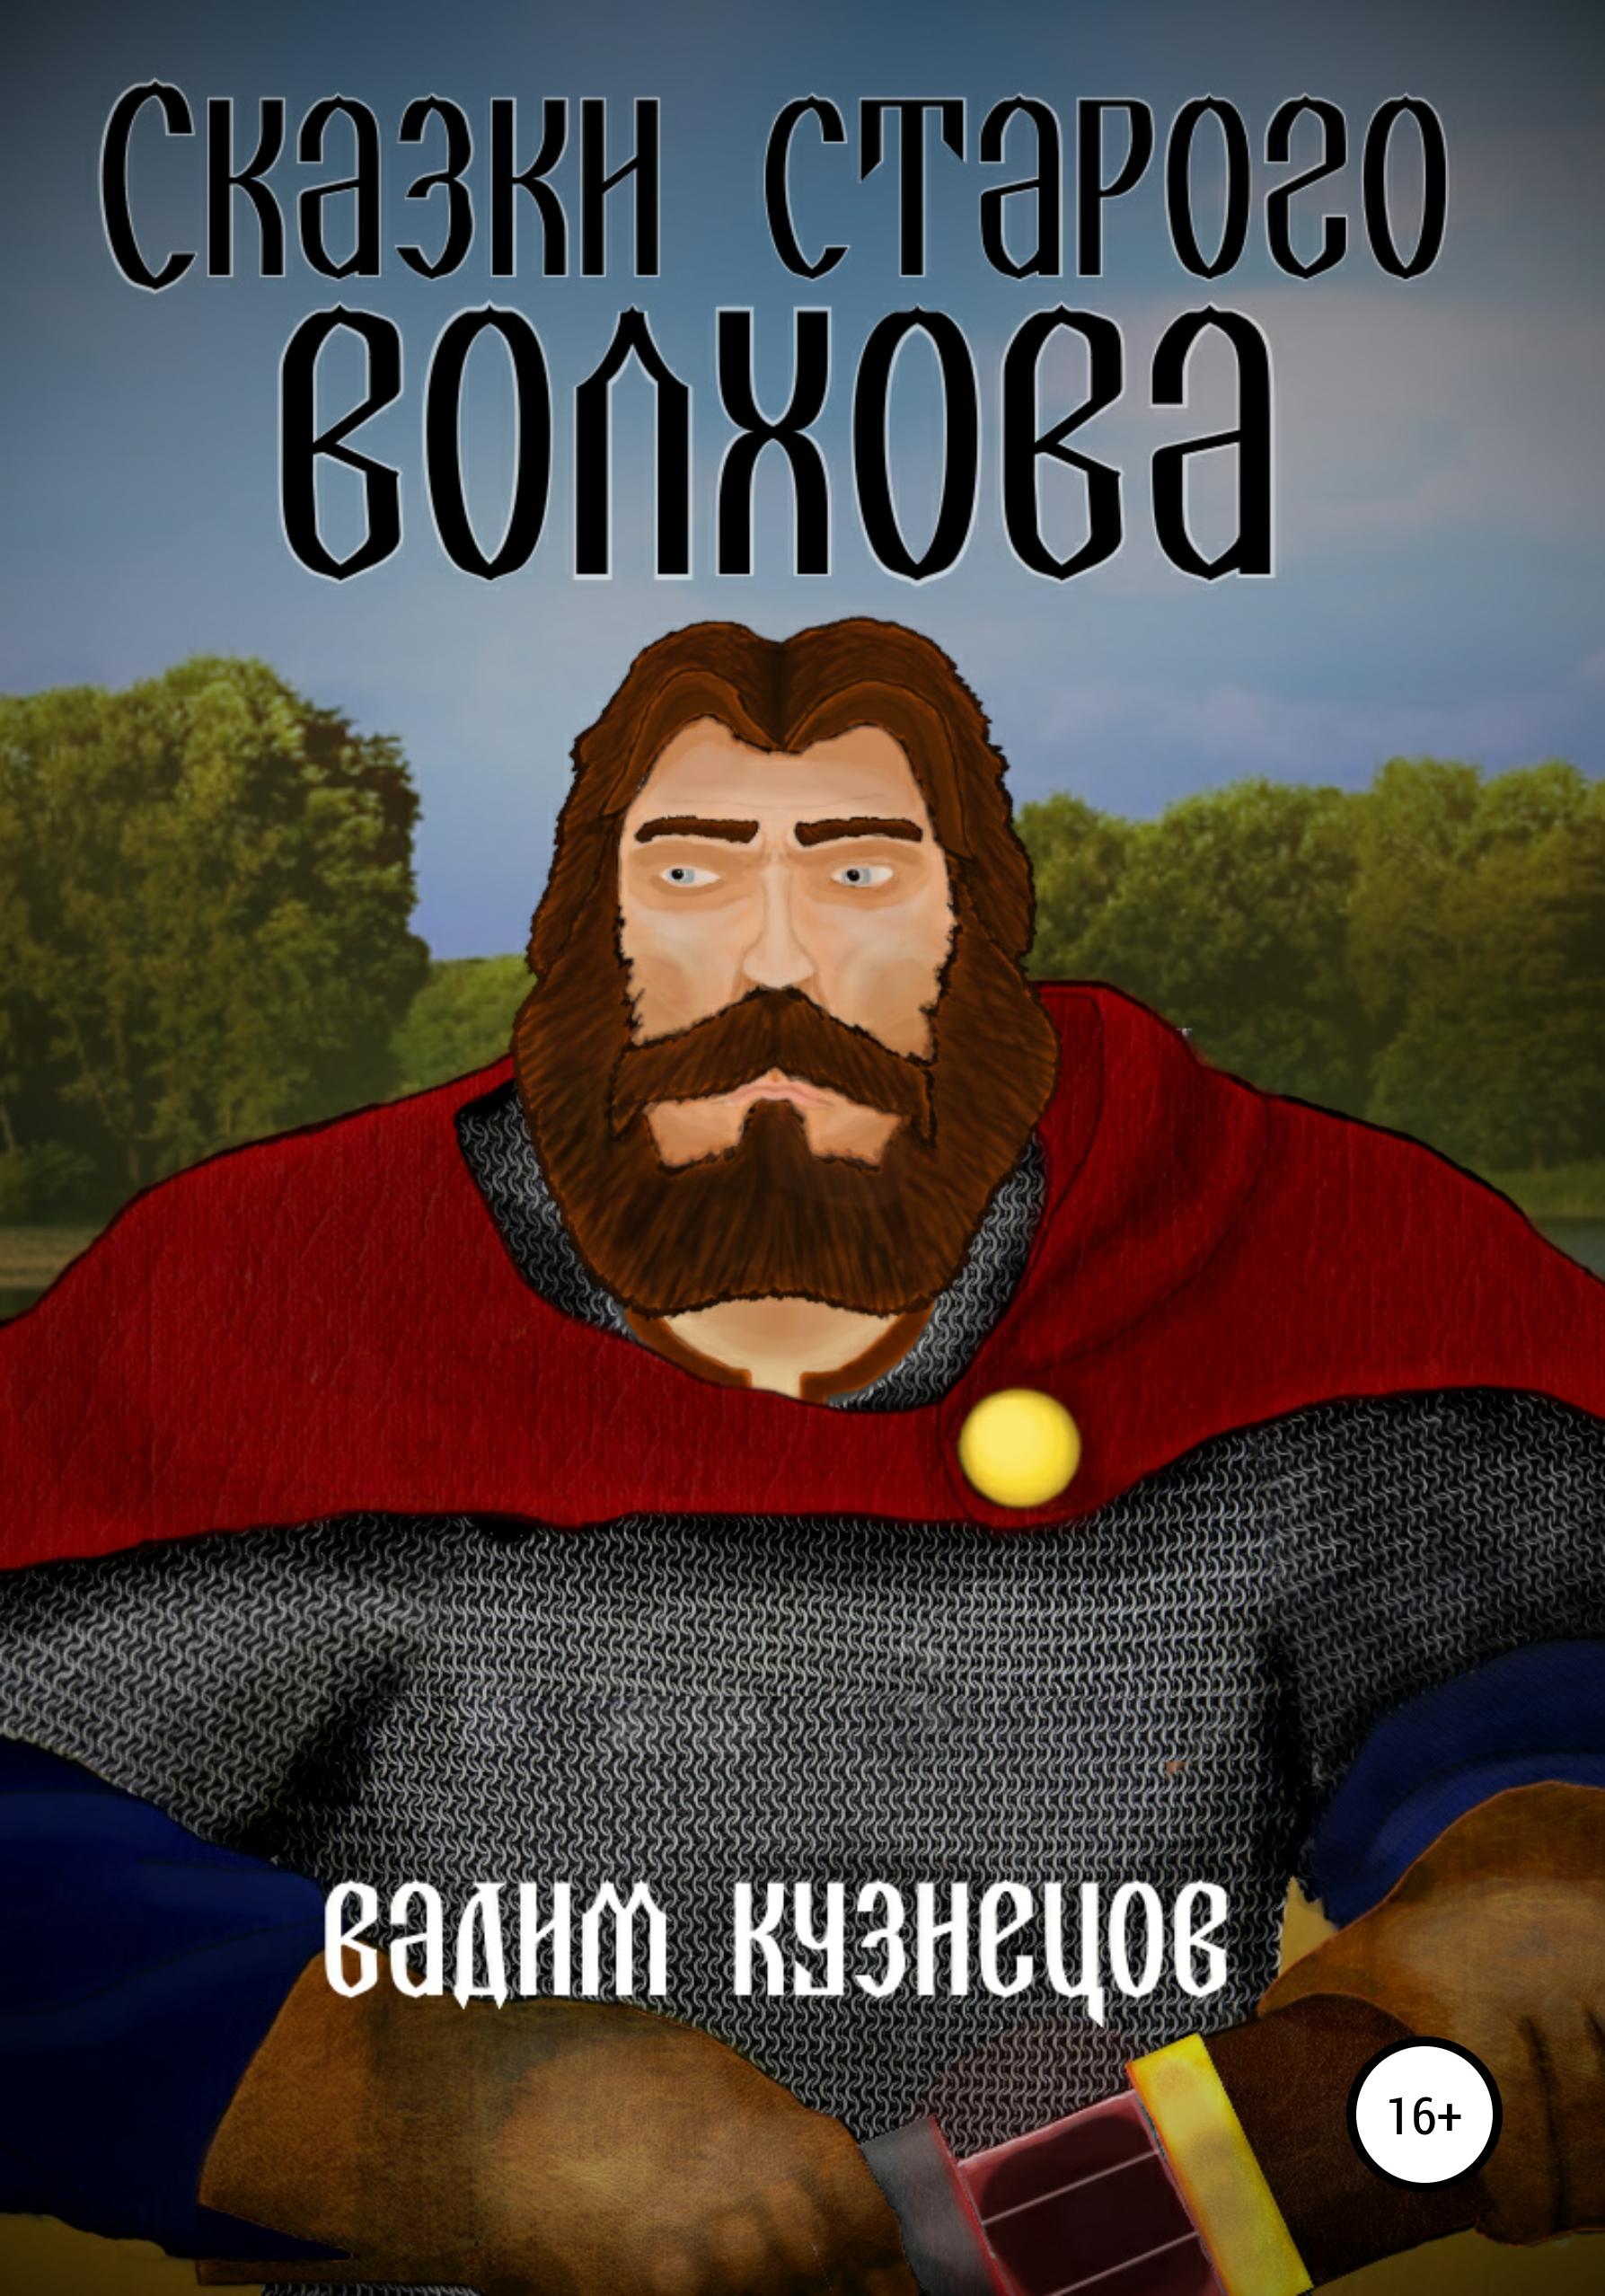 Вадим Кузнецов - Сказки старого Волхова